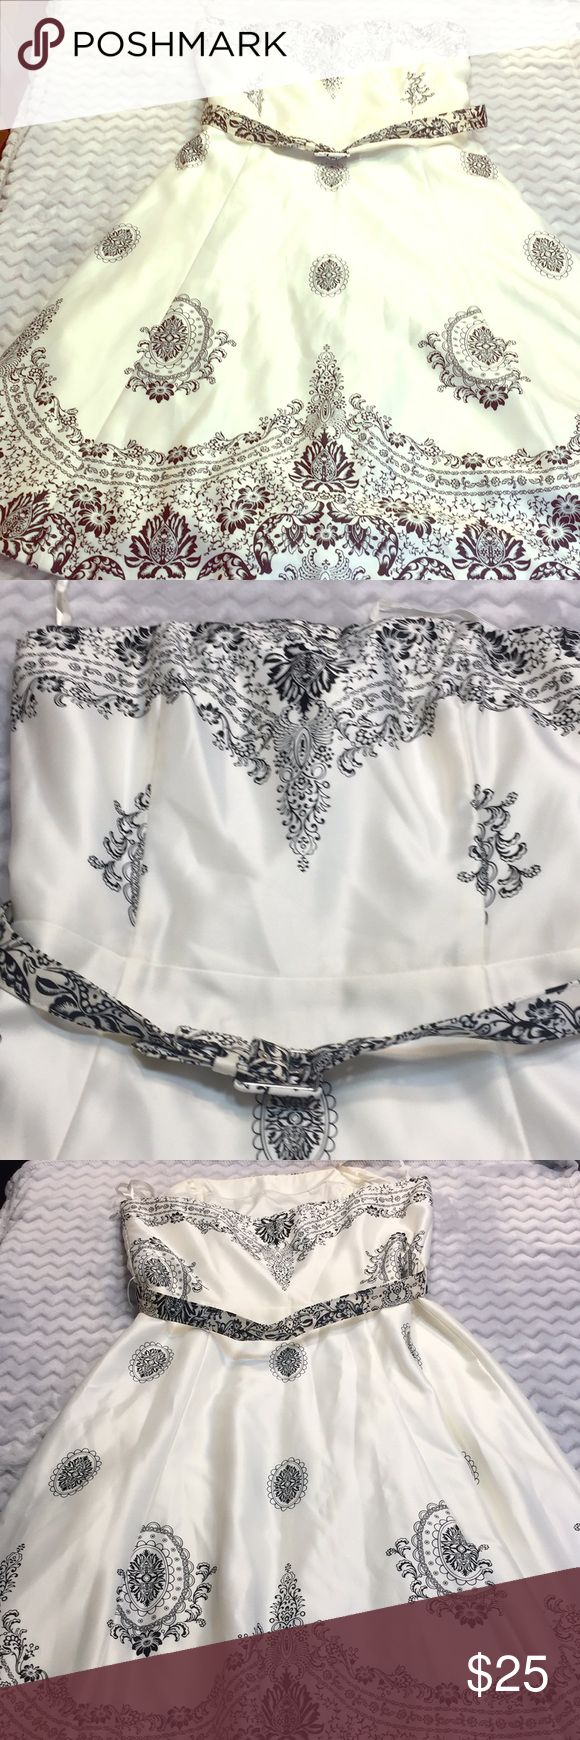 White House Black Market Strapless Dress Sz 6 White House Black Market Strapless…